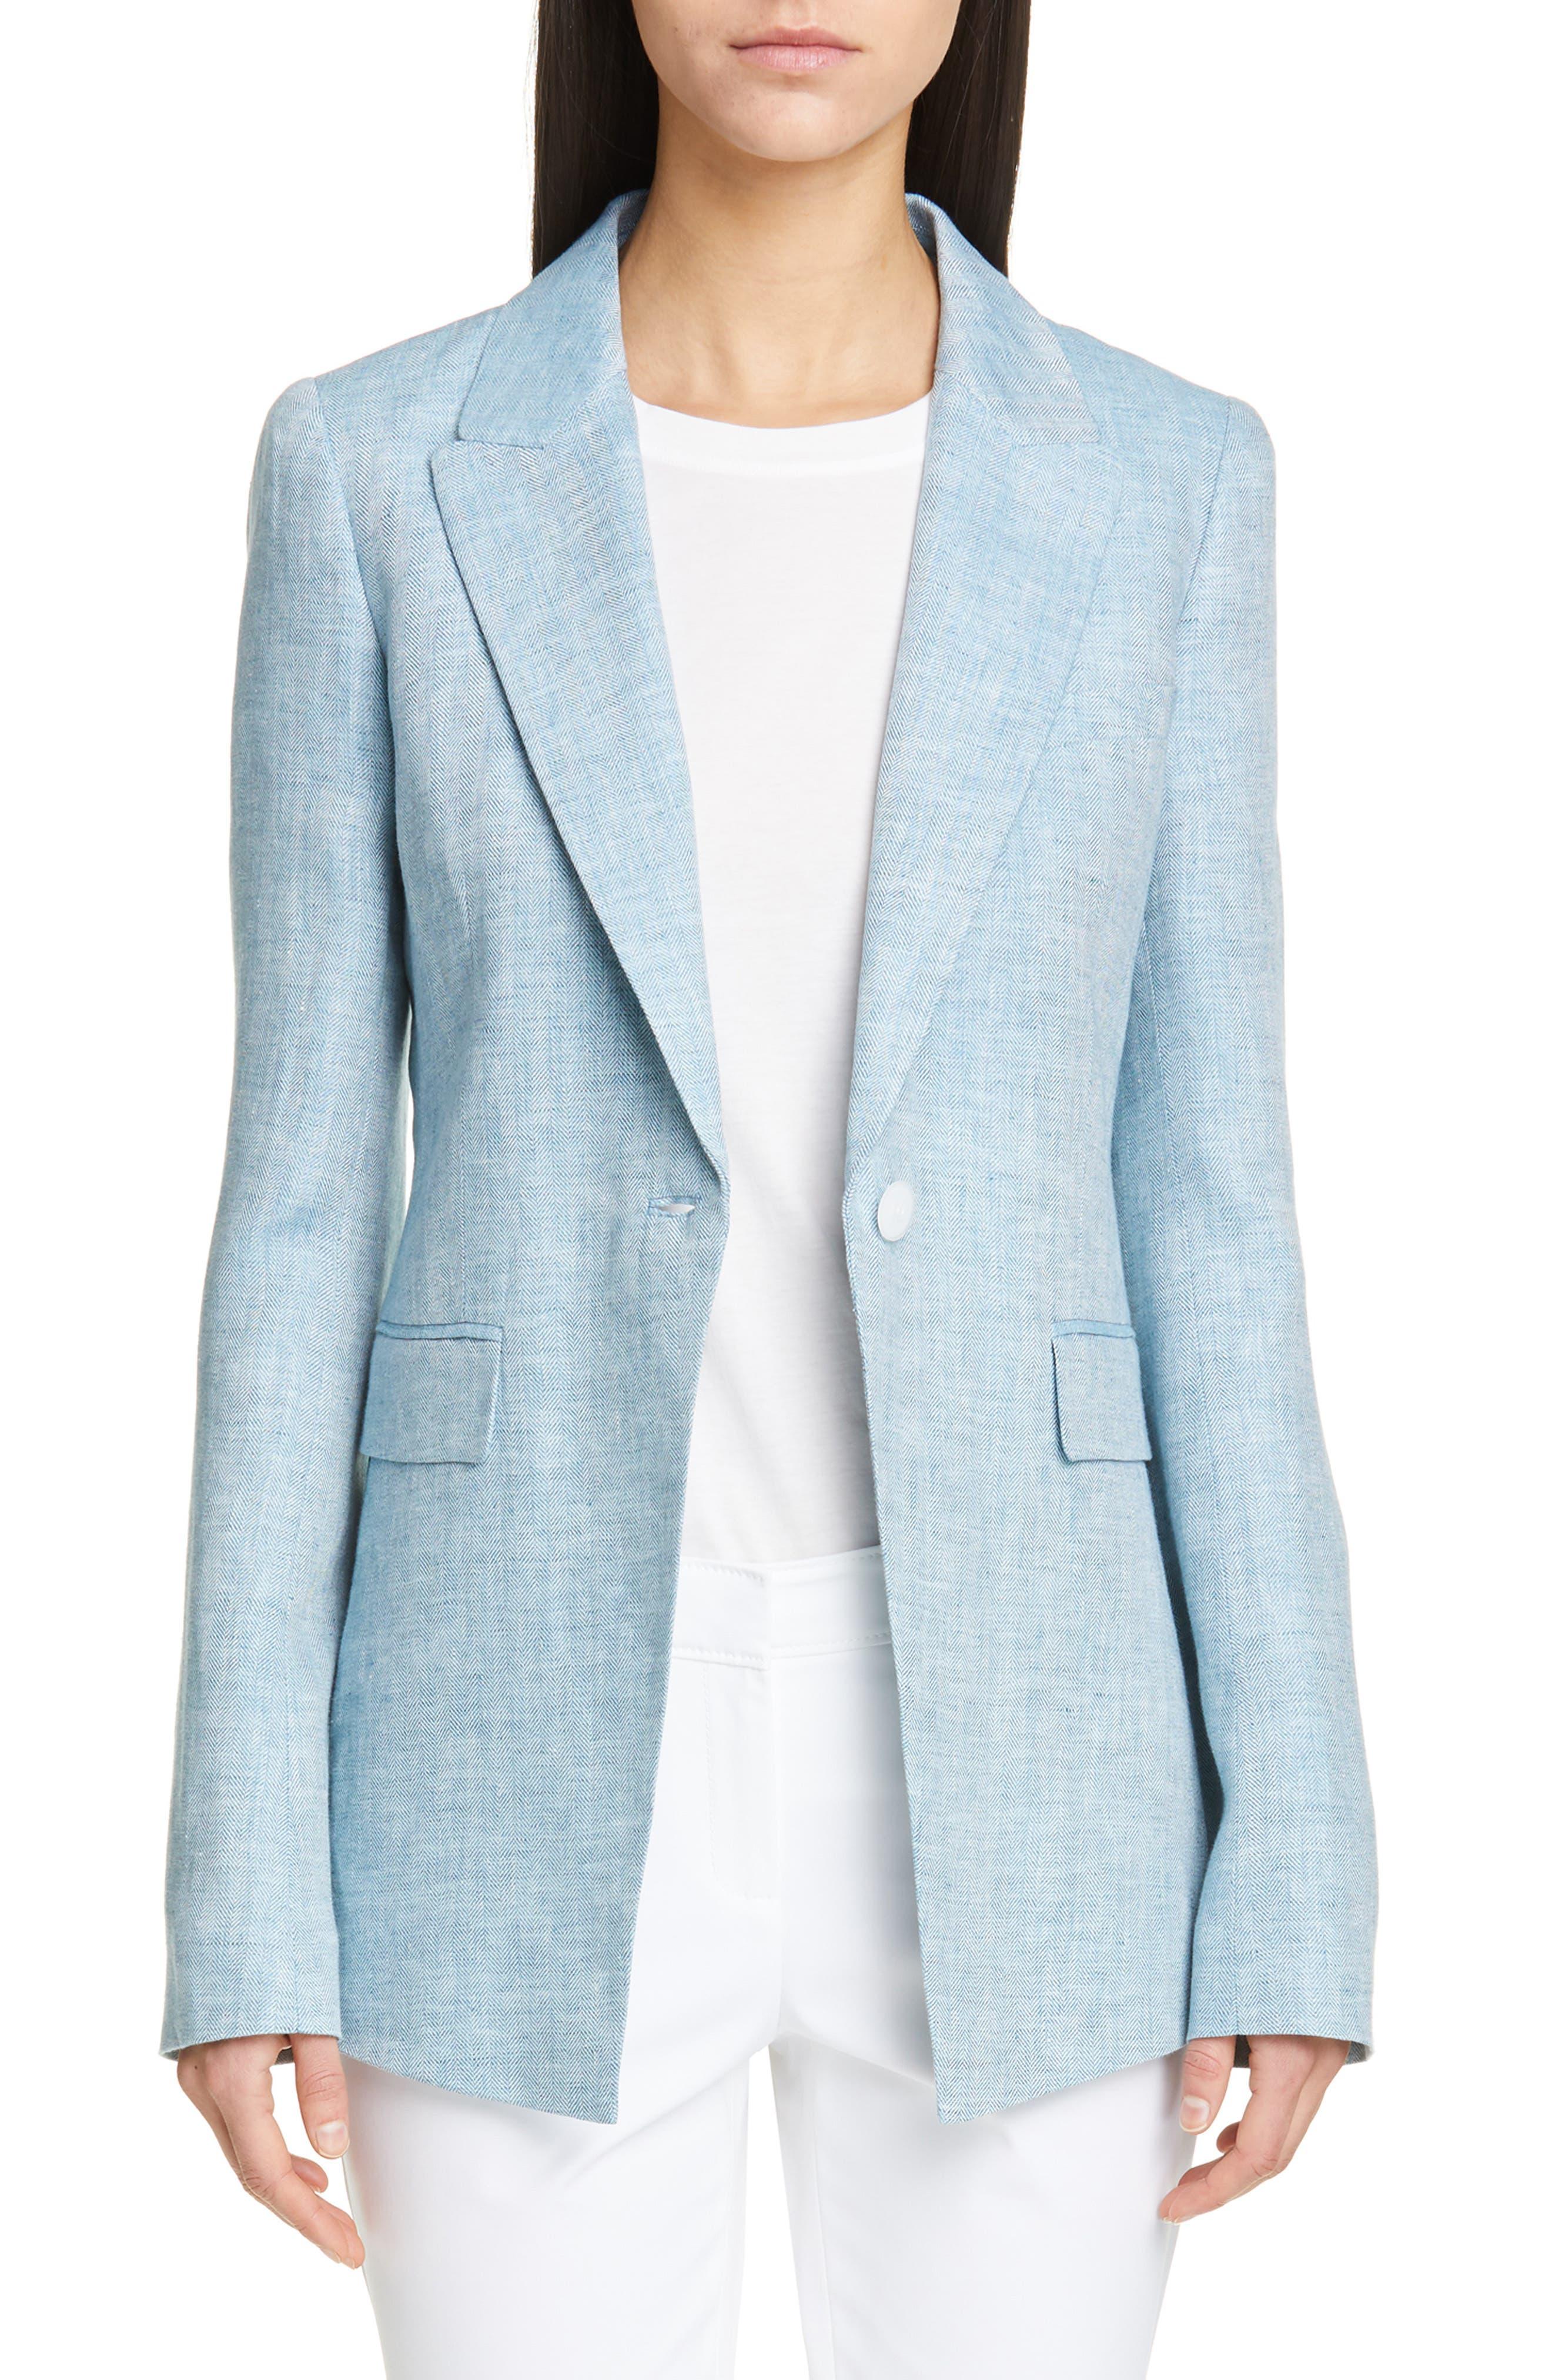 LAFAYETTE 148 NEW YORK Heather Linen Jacket, Main, color, BLUE STEEL MULTI